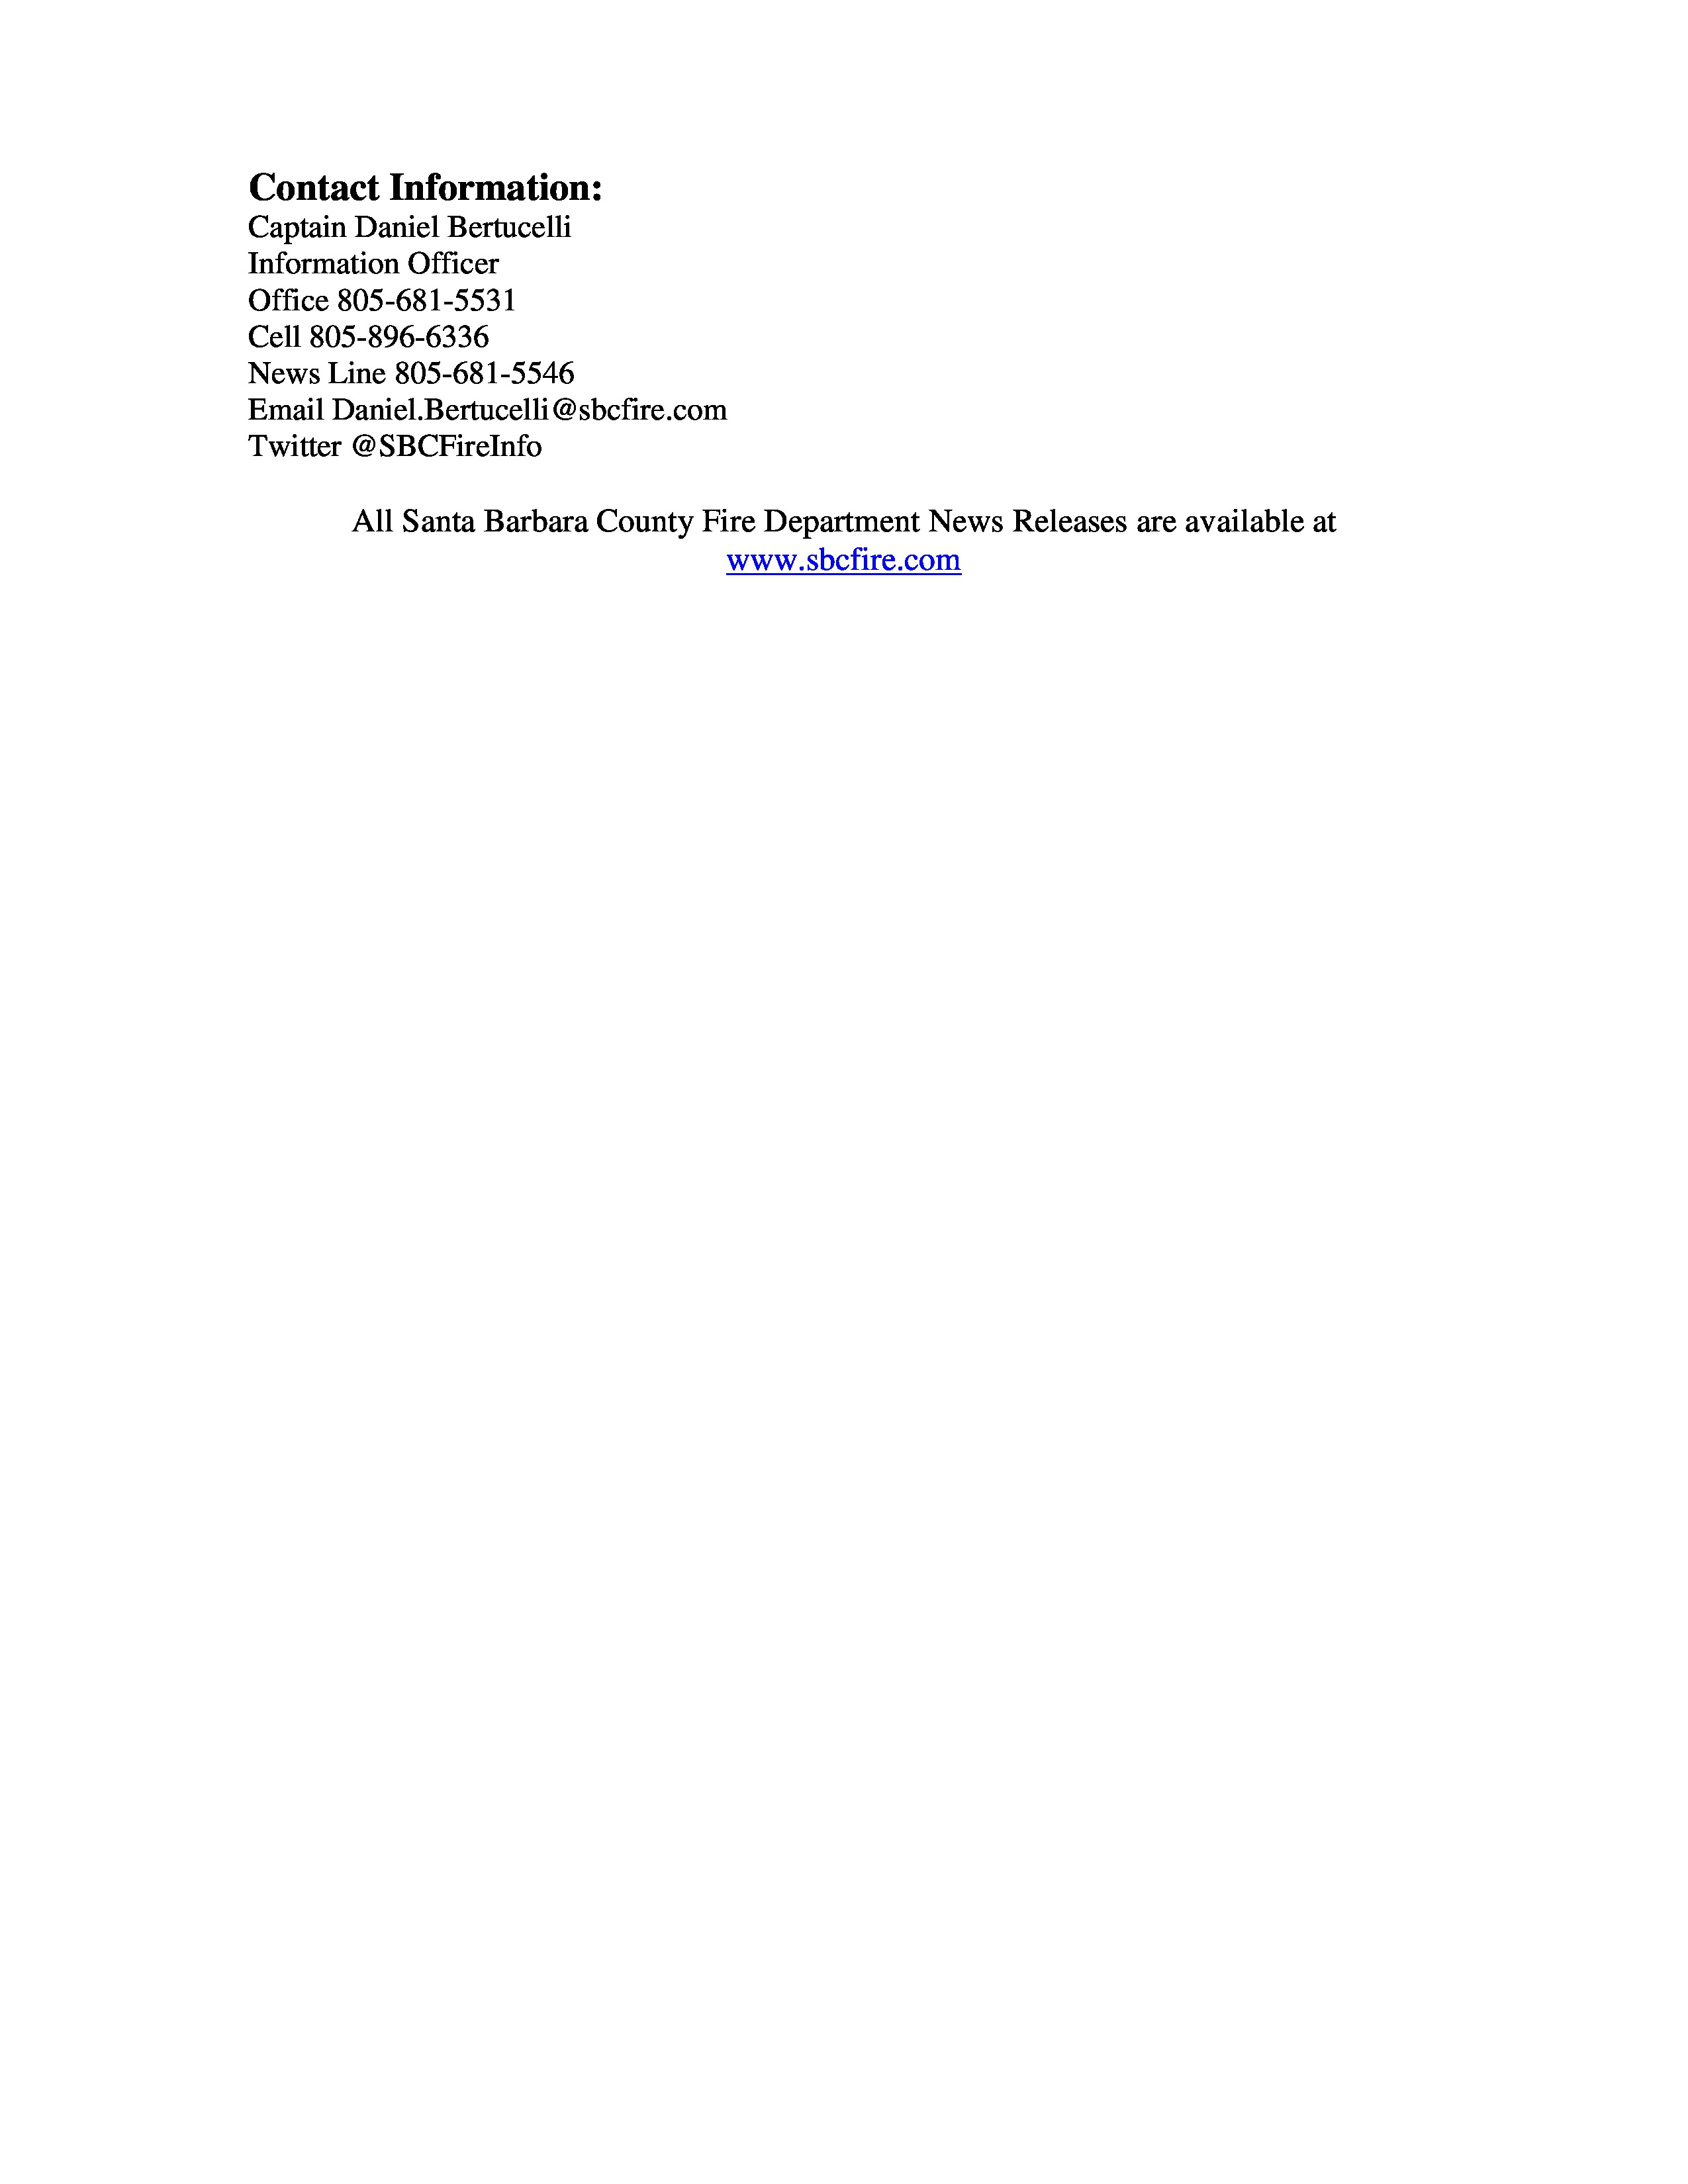 Riley Retirement News Release-3